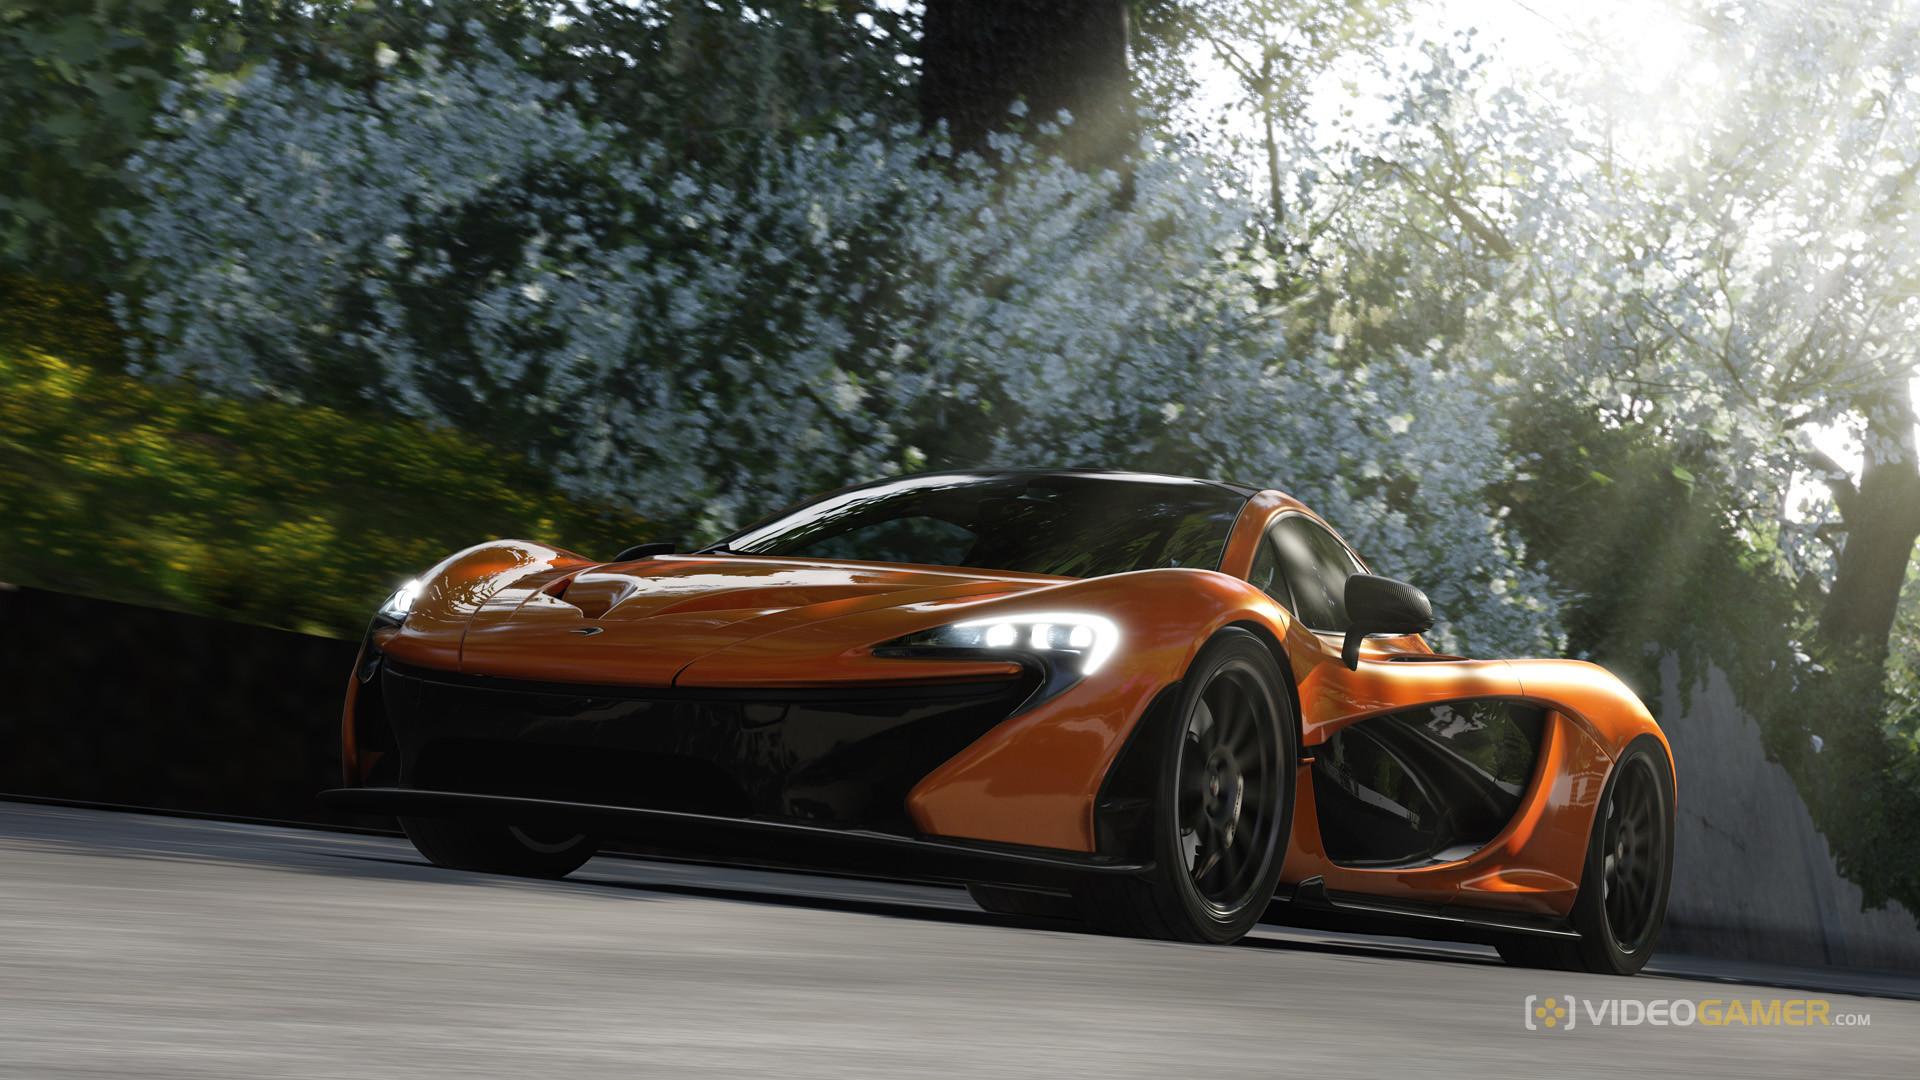 Forza Motorsport 5 Screenshot for Xbox One 1920x1080